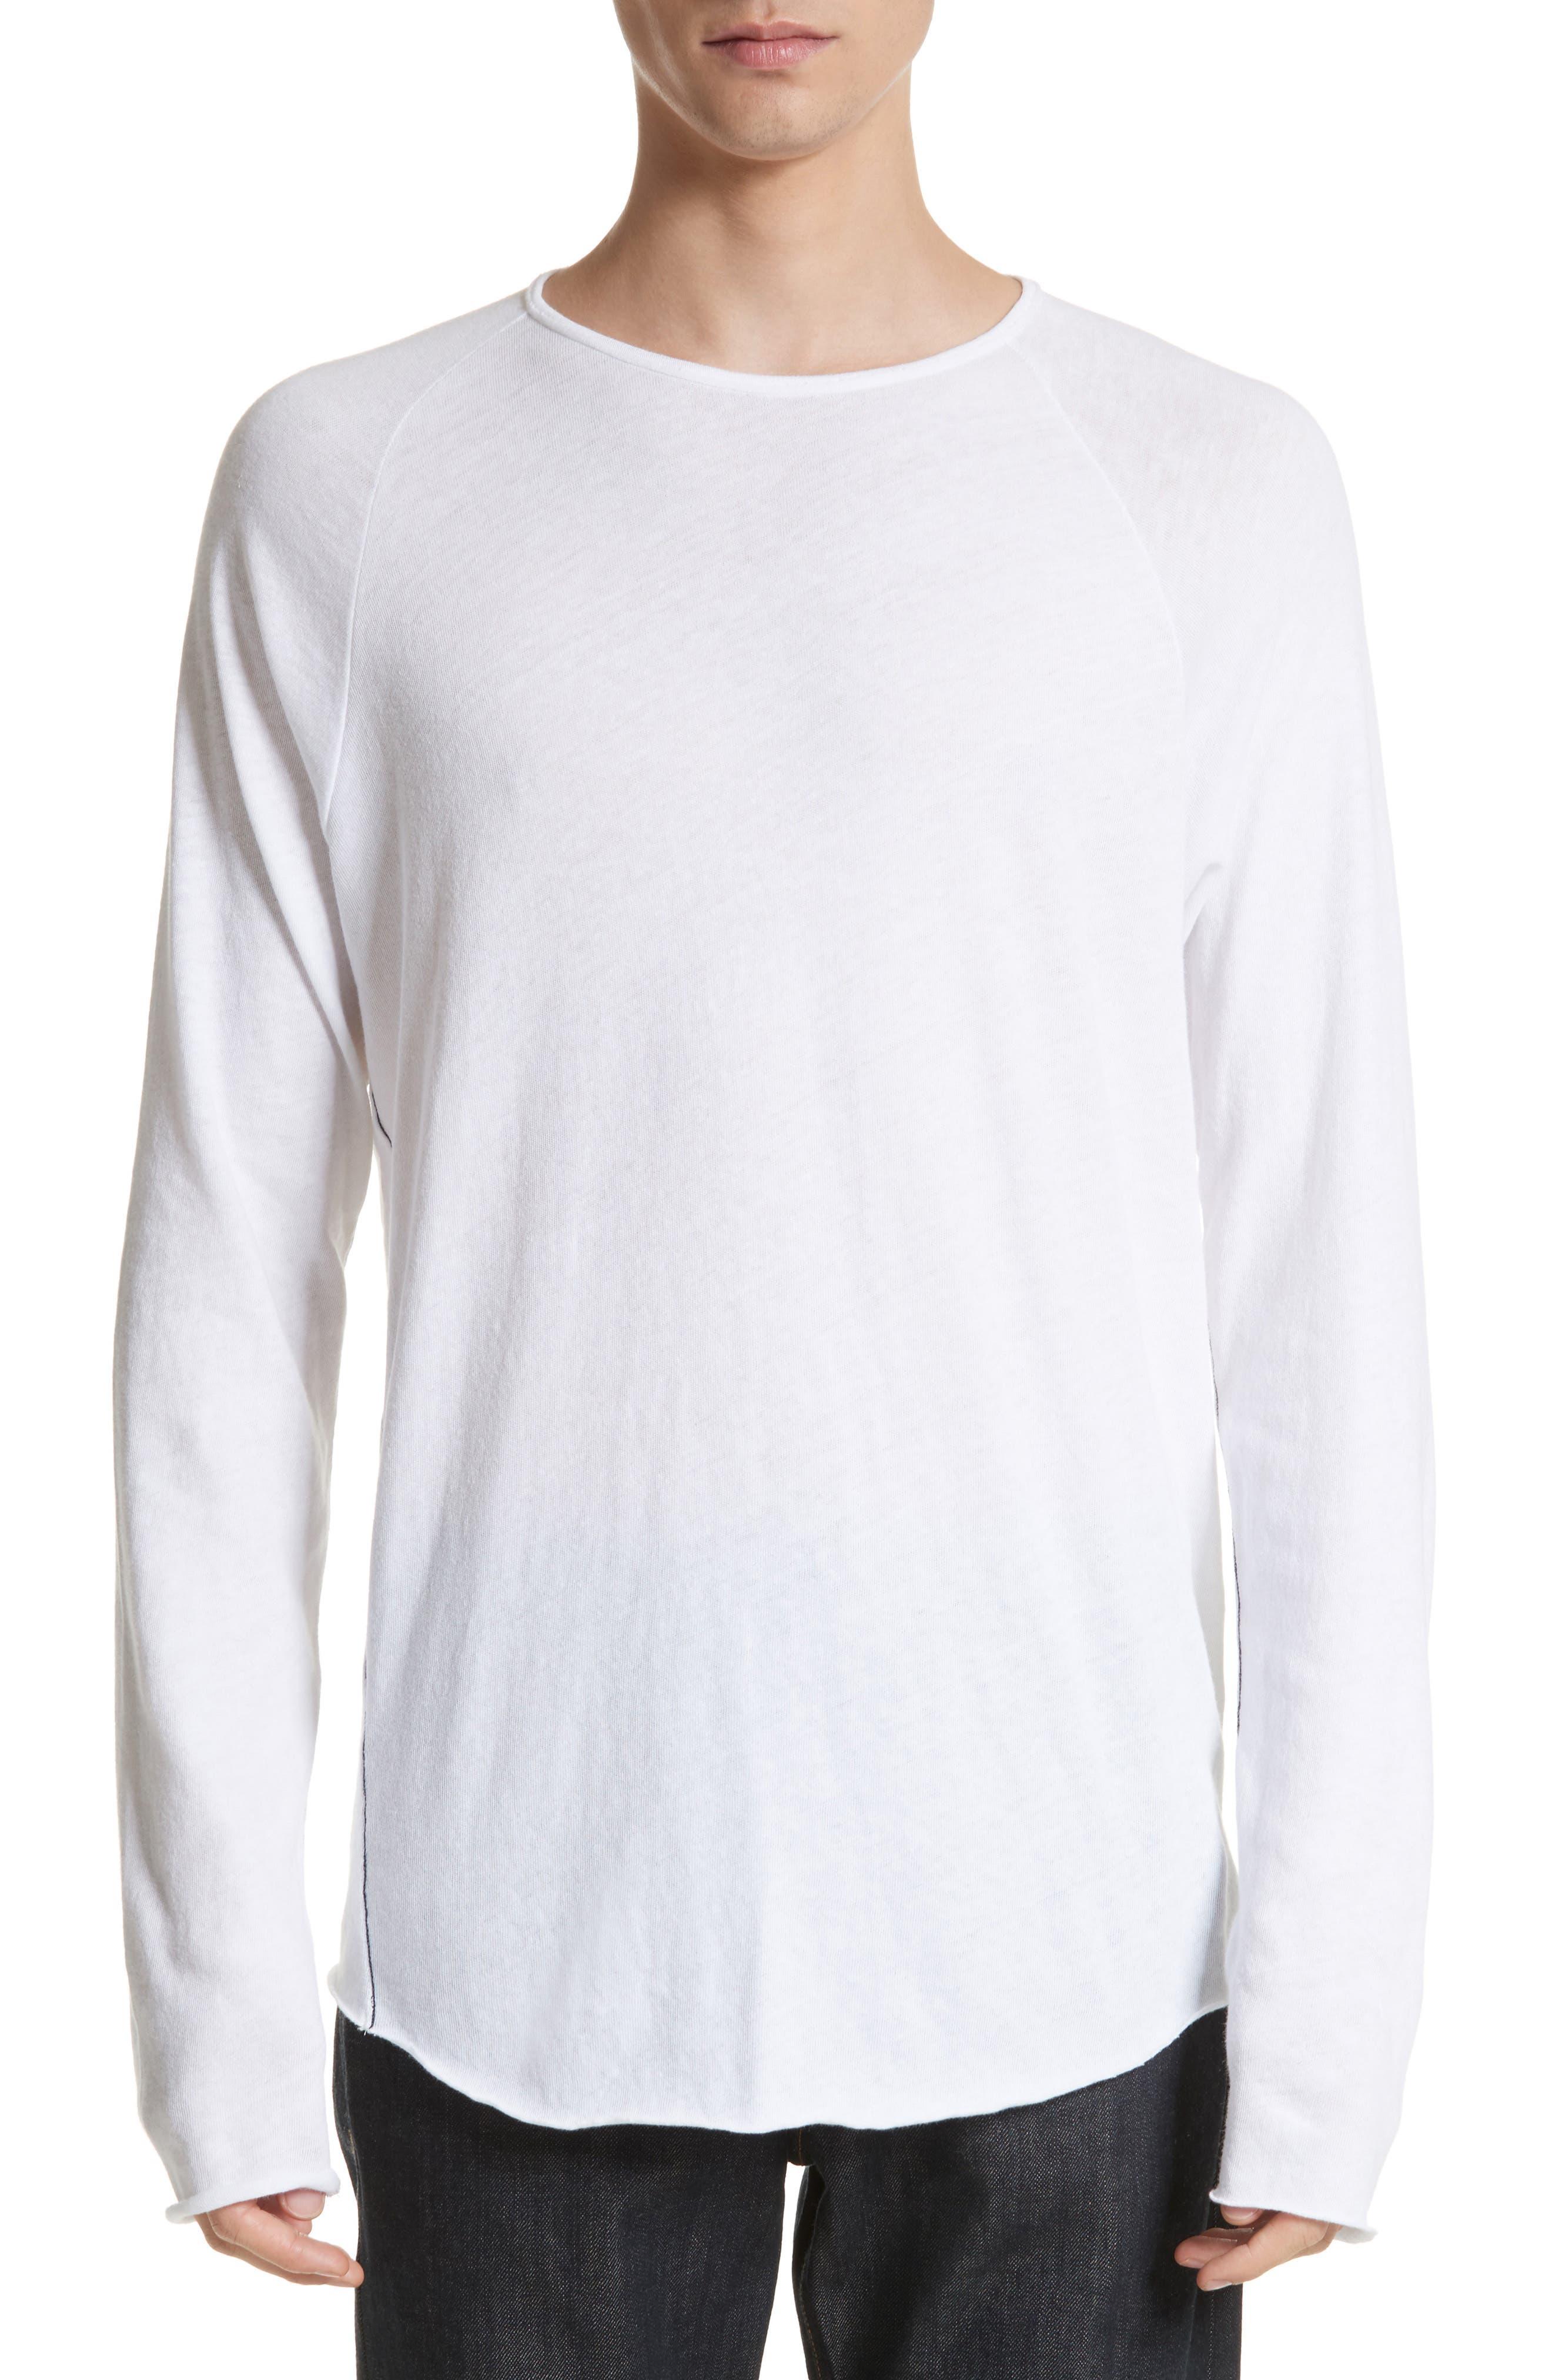 Rupert Long Sleeve T-Shirt,                             Main thumbnail 1, color,                             100